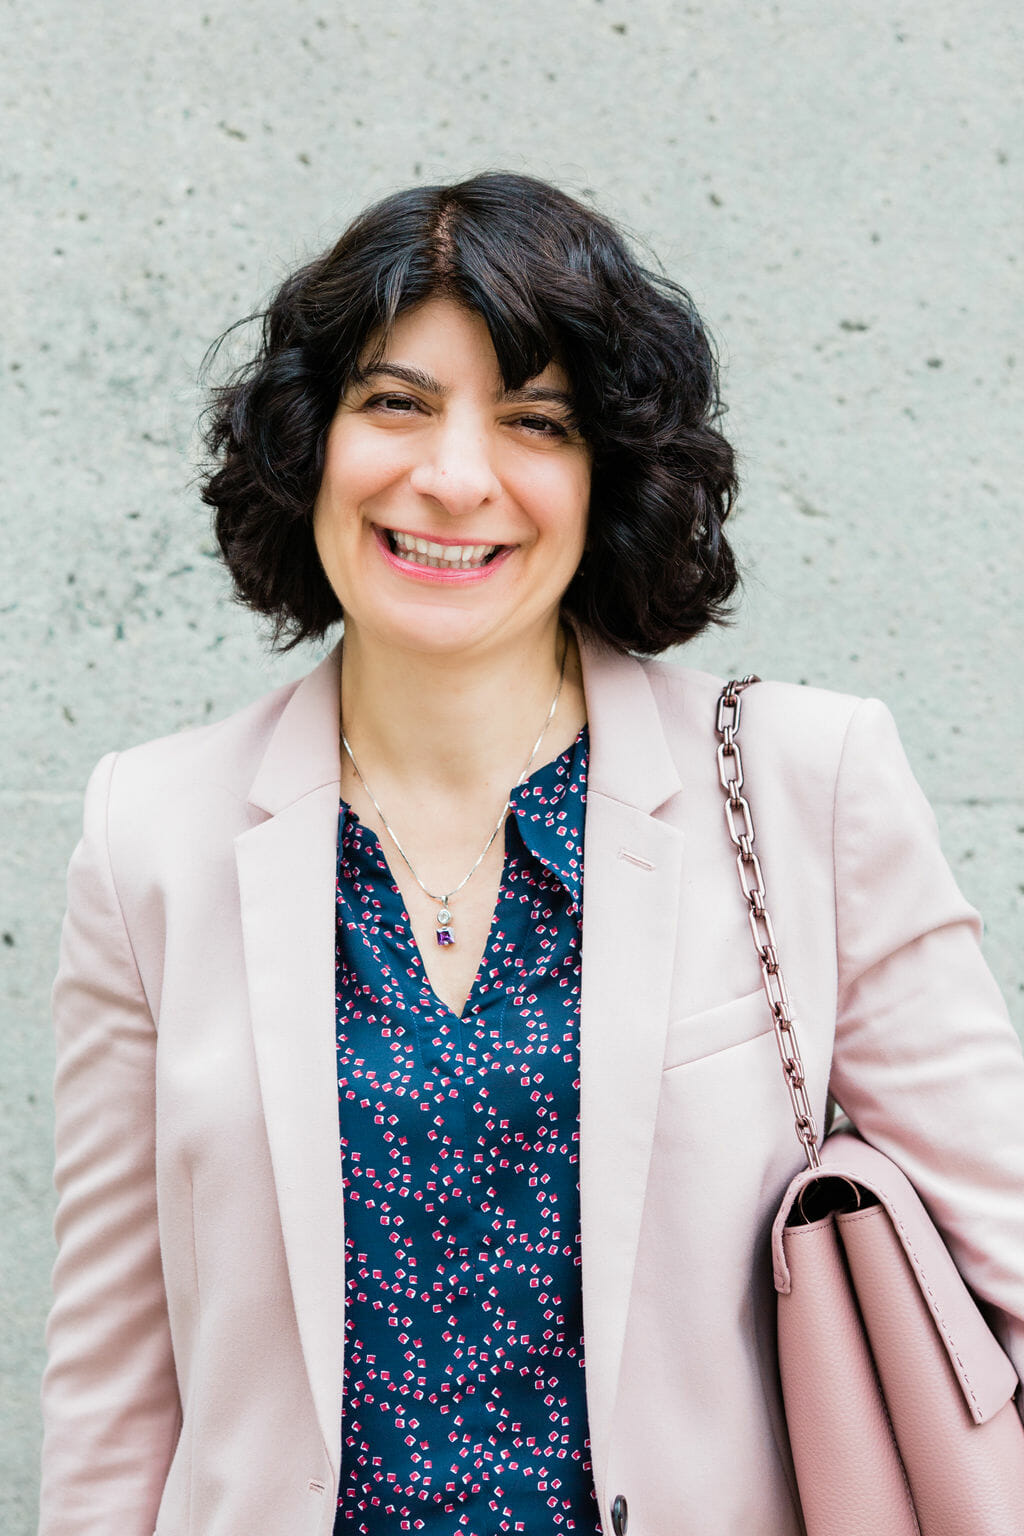 Assunta Iannilli, a BC small business CPA and virtual CFO in Vancouver, Canada